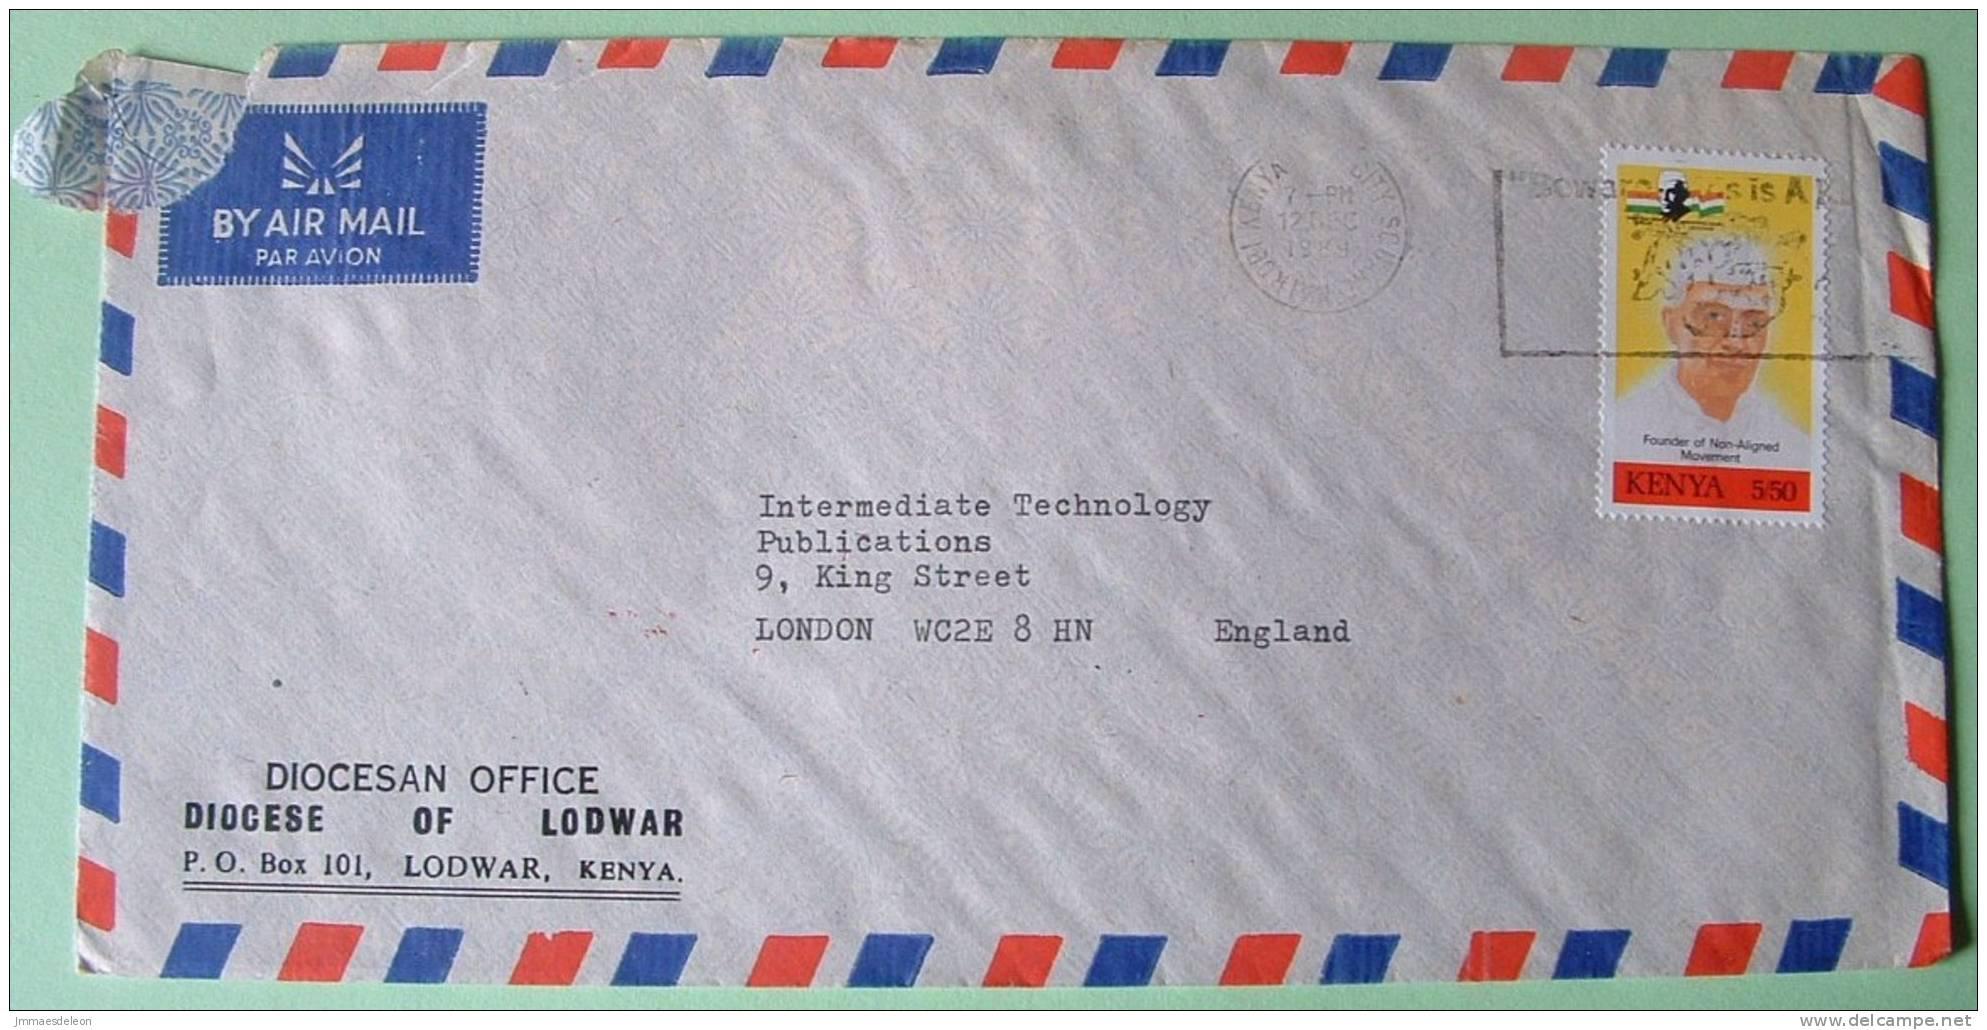 Kenya 1989 Cover To England UK - Nehru (India) Non-aligned Movement (Scott # 503 - Cat Val = 4.5 $) - Kenya (1963-...)